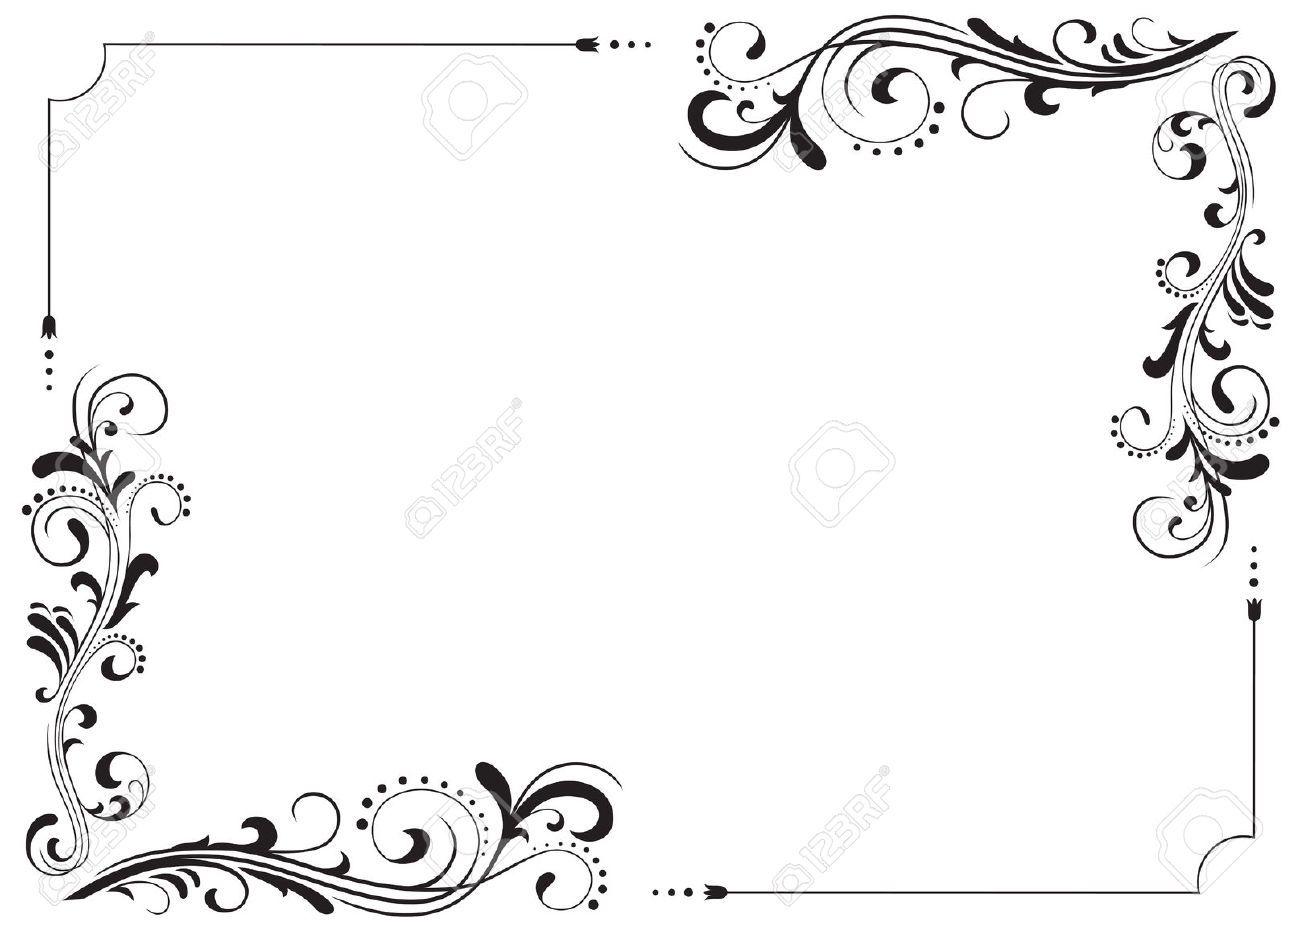 6722316 motivos ornamentales para la decoraci n ilustraci